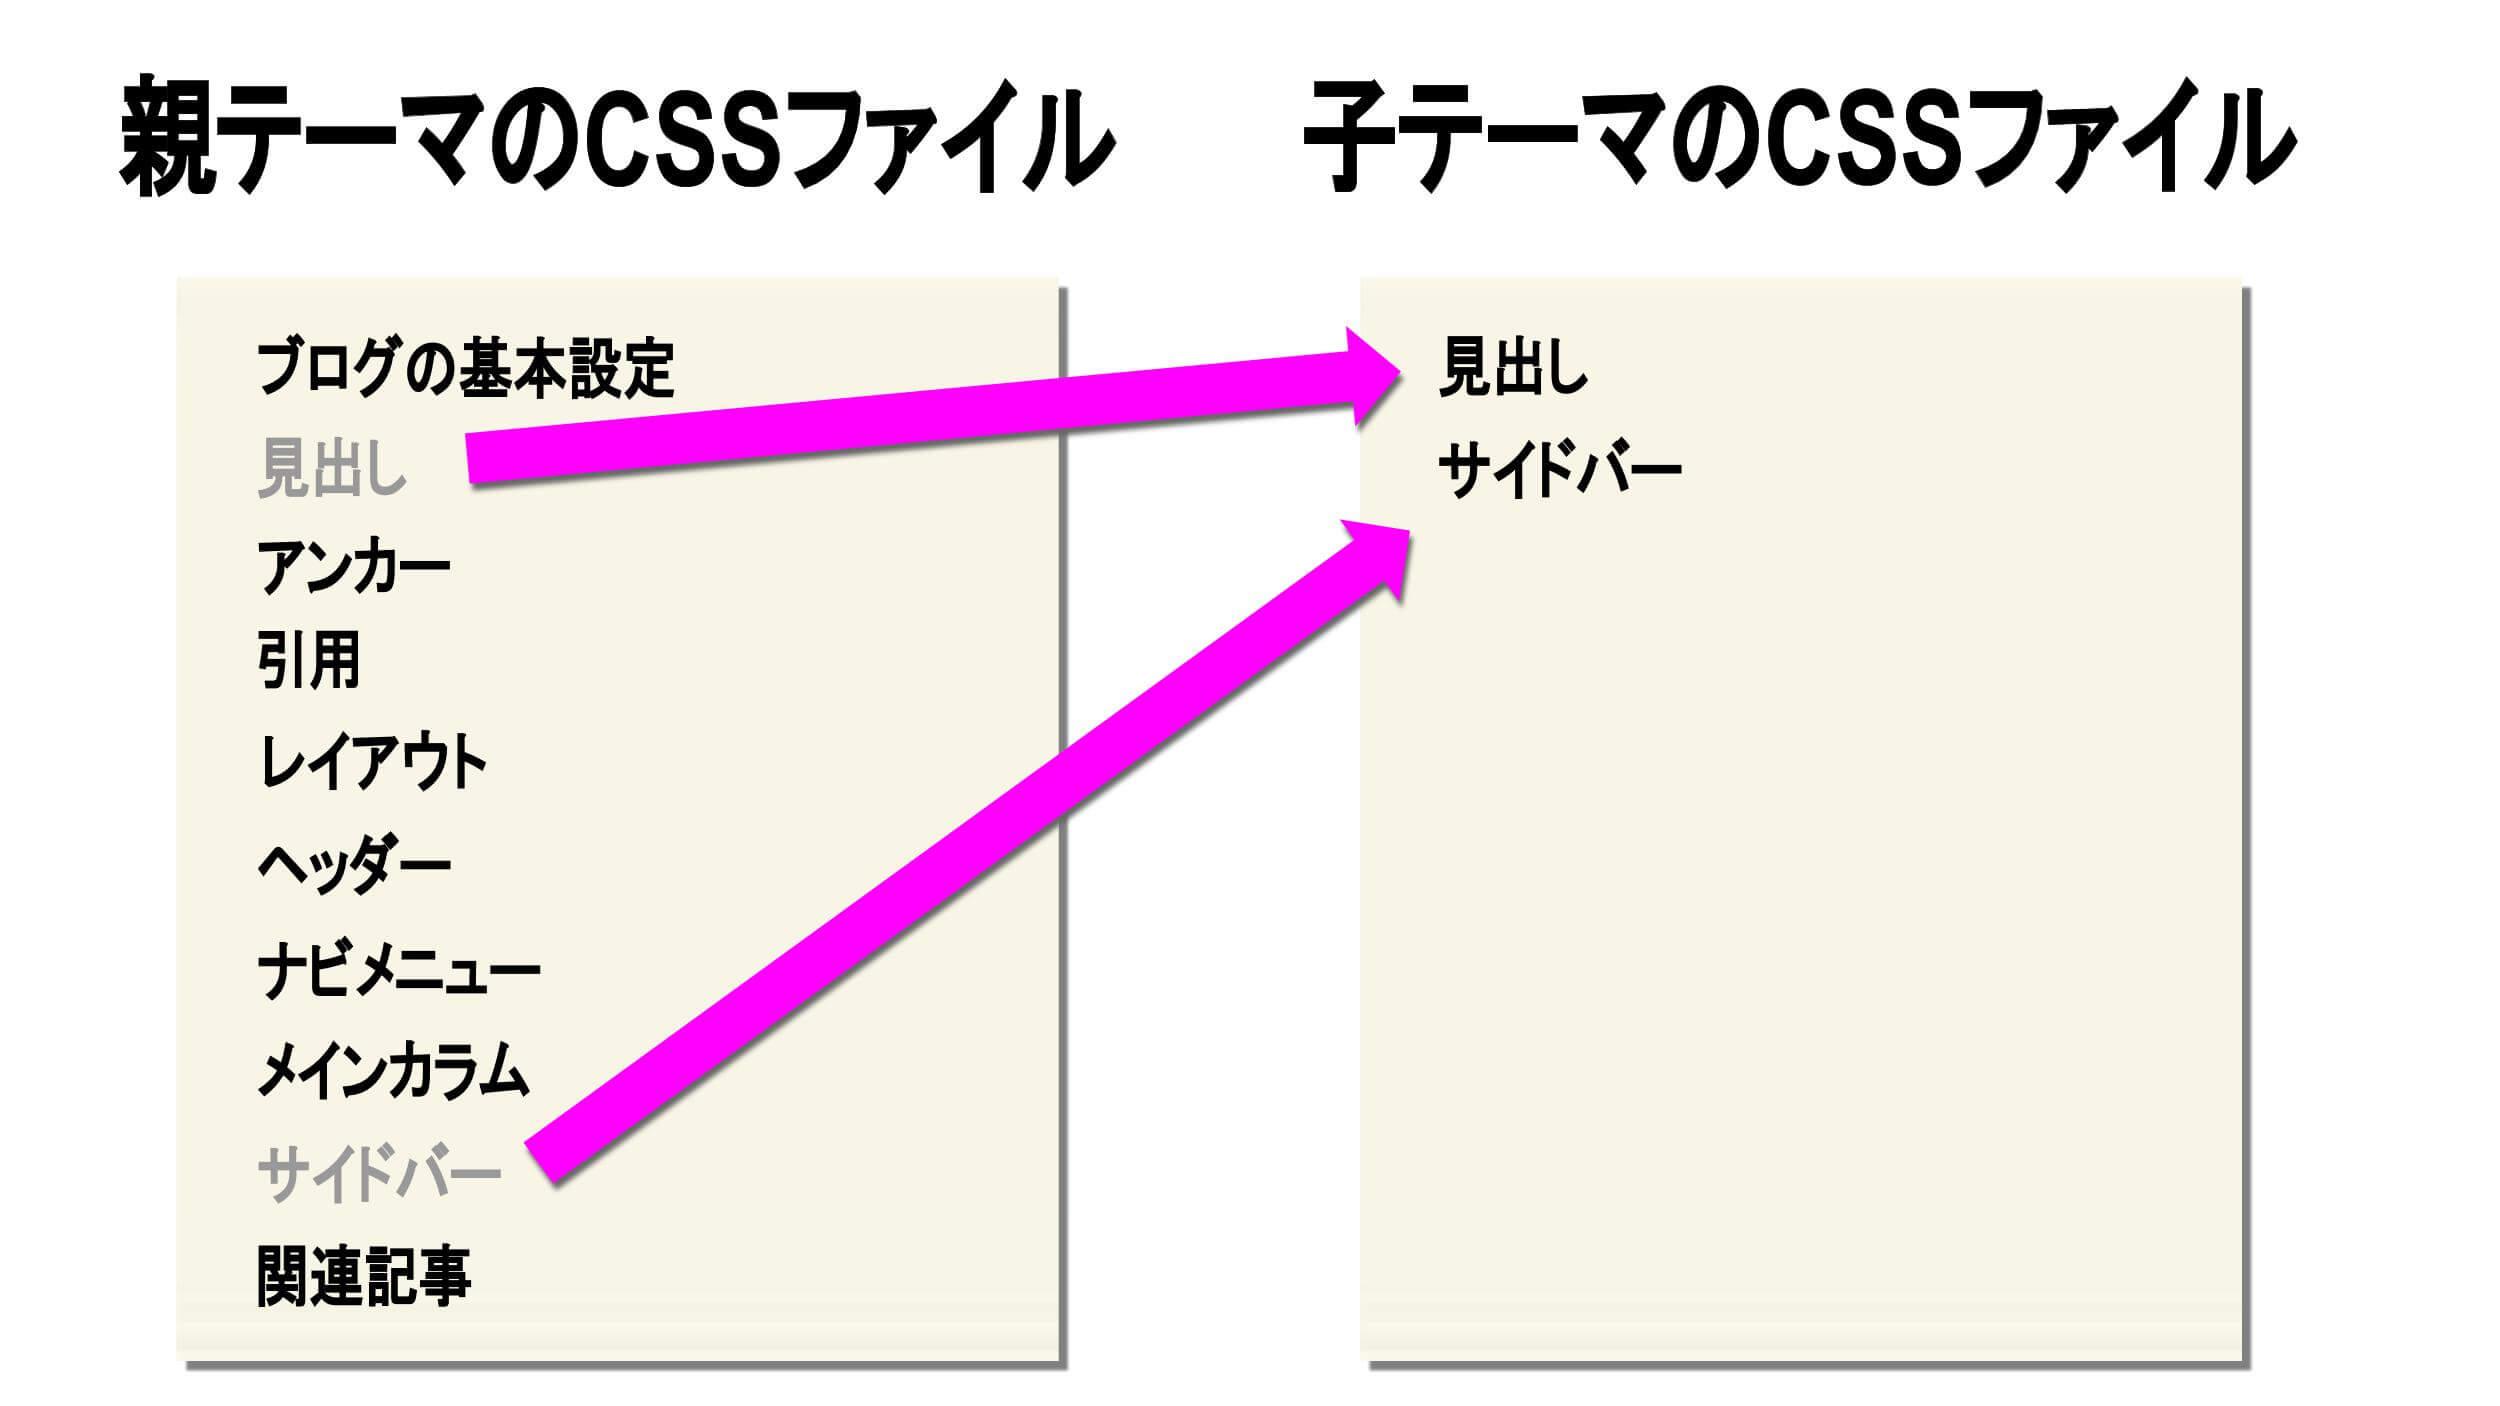 CSSファイルの親テーマと子テーマの関係性